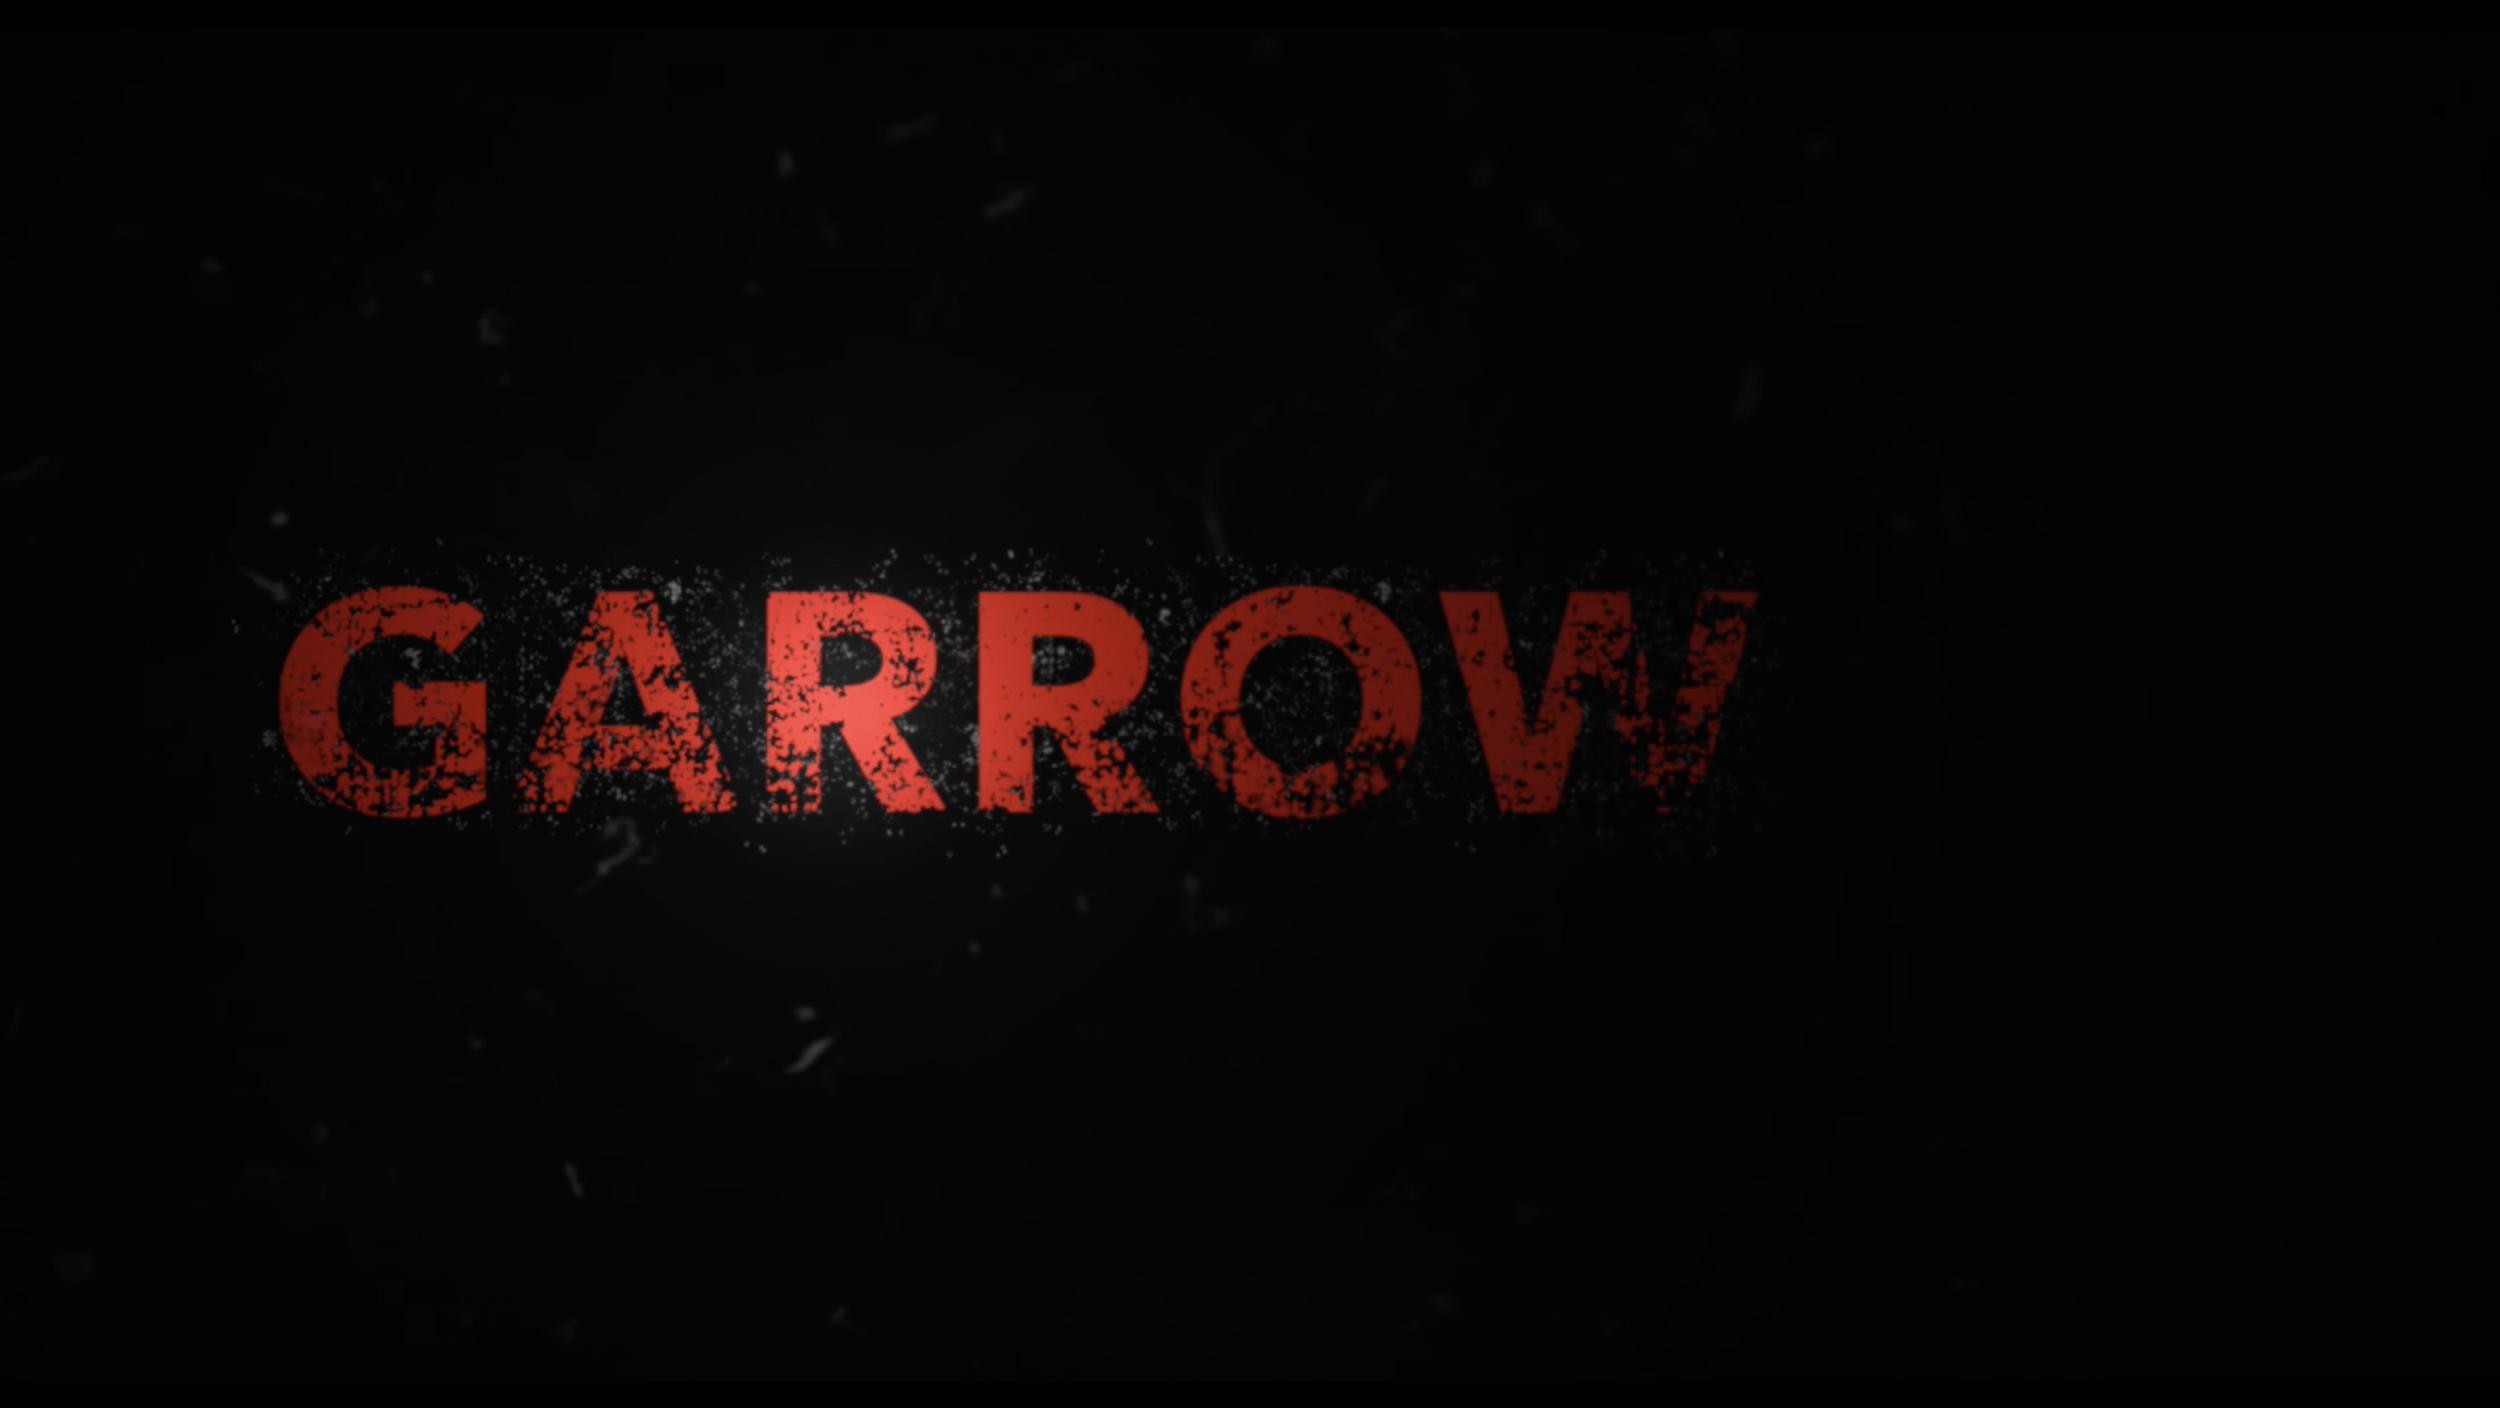 GARROW